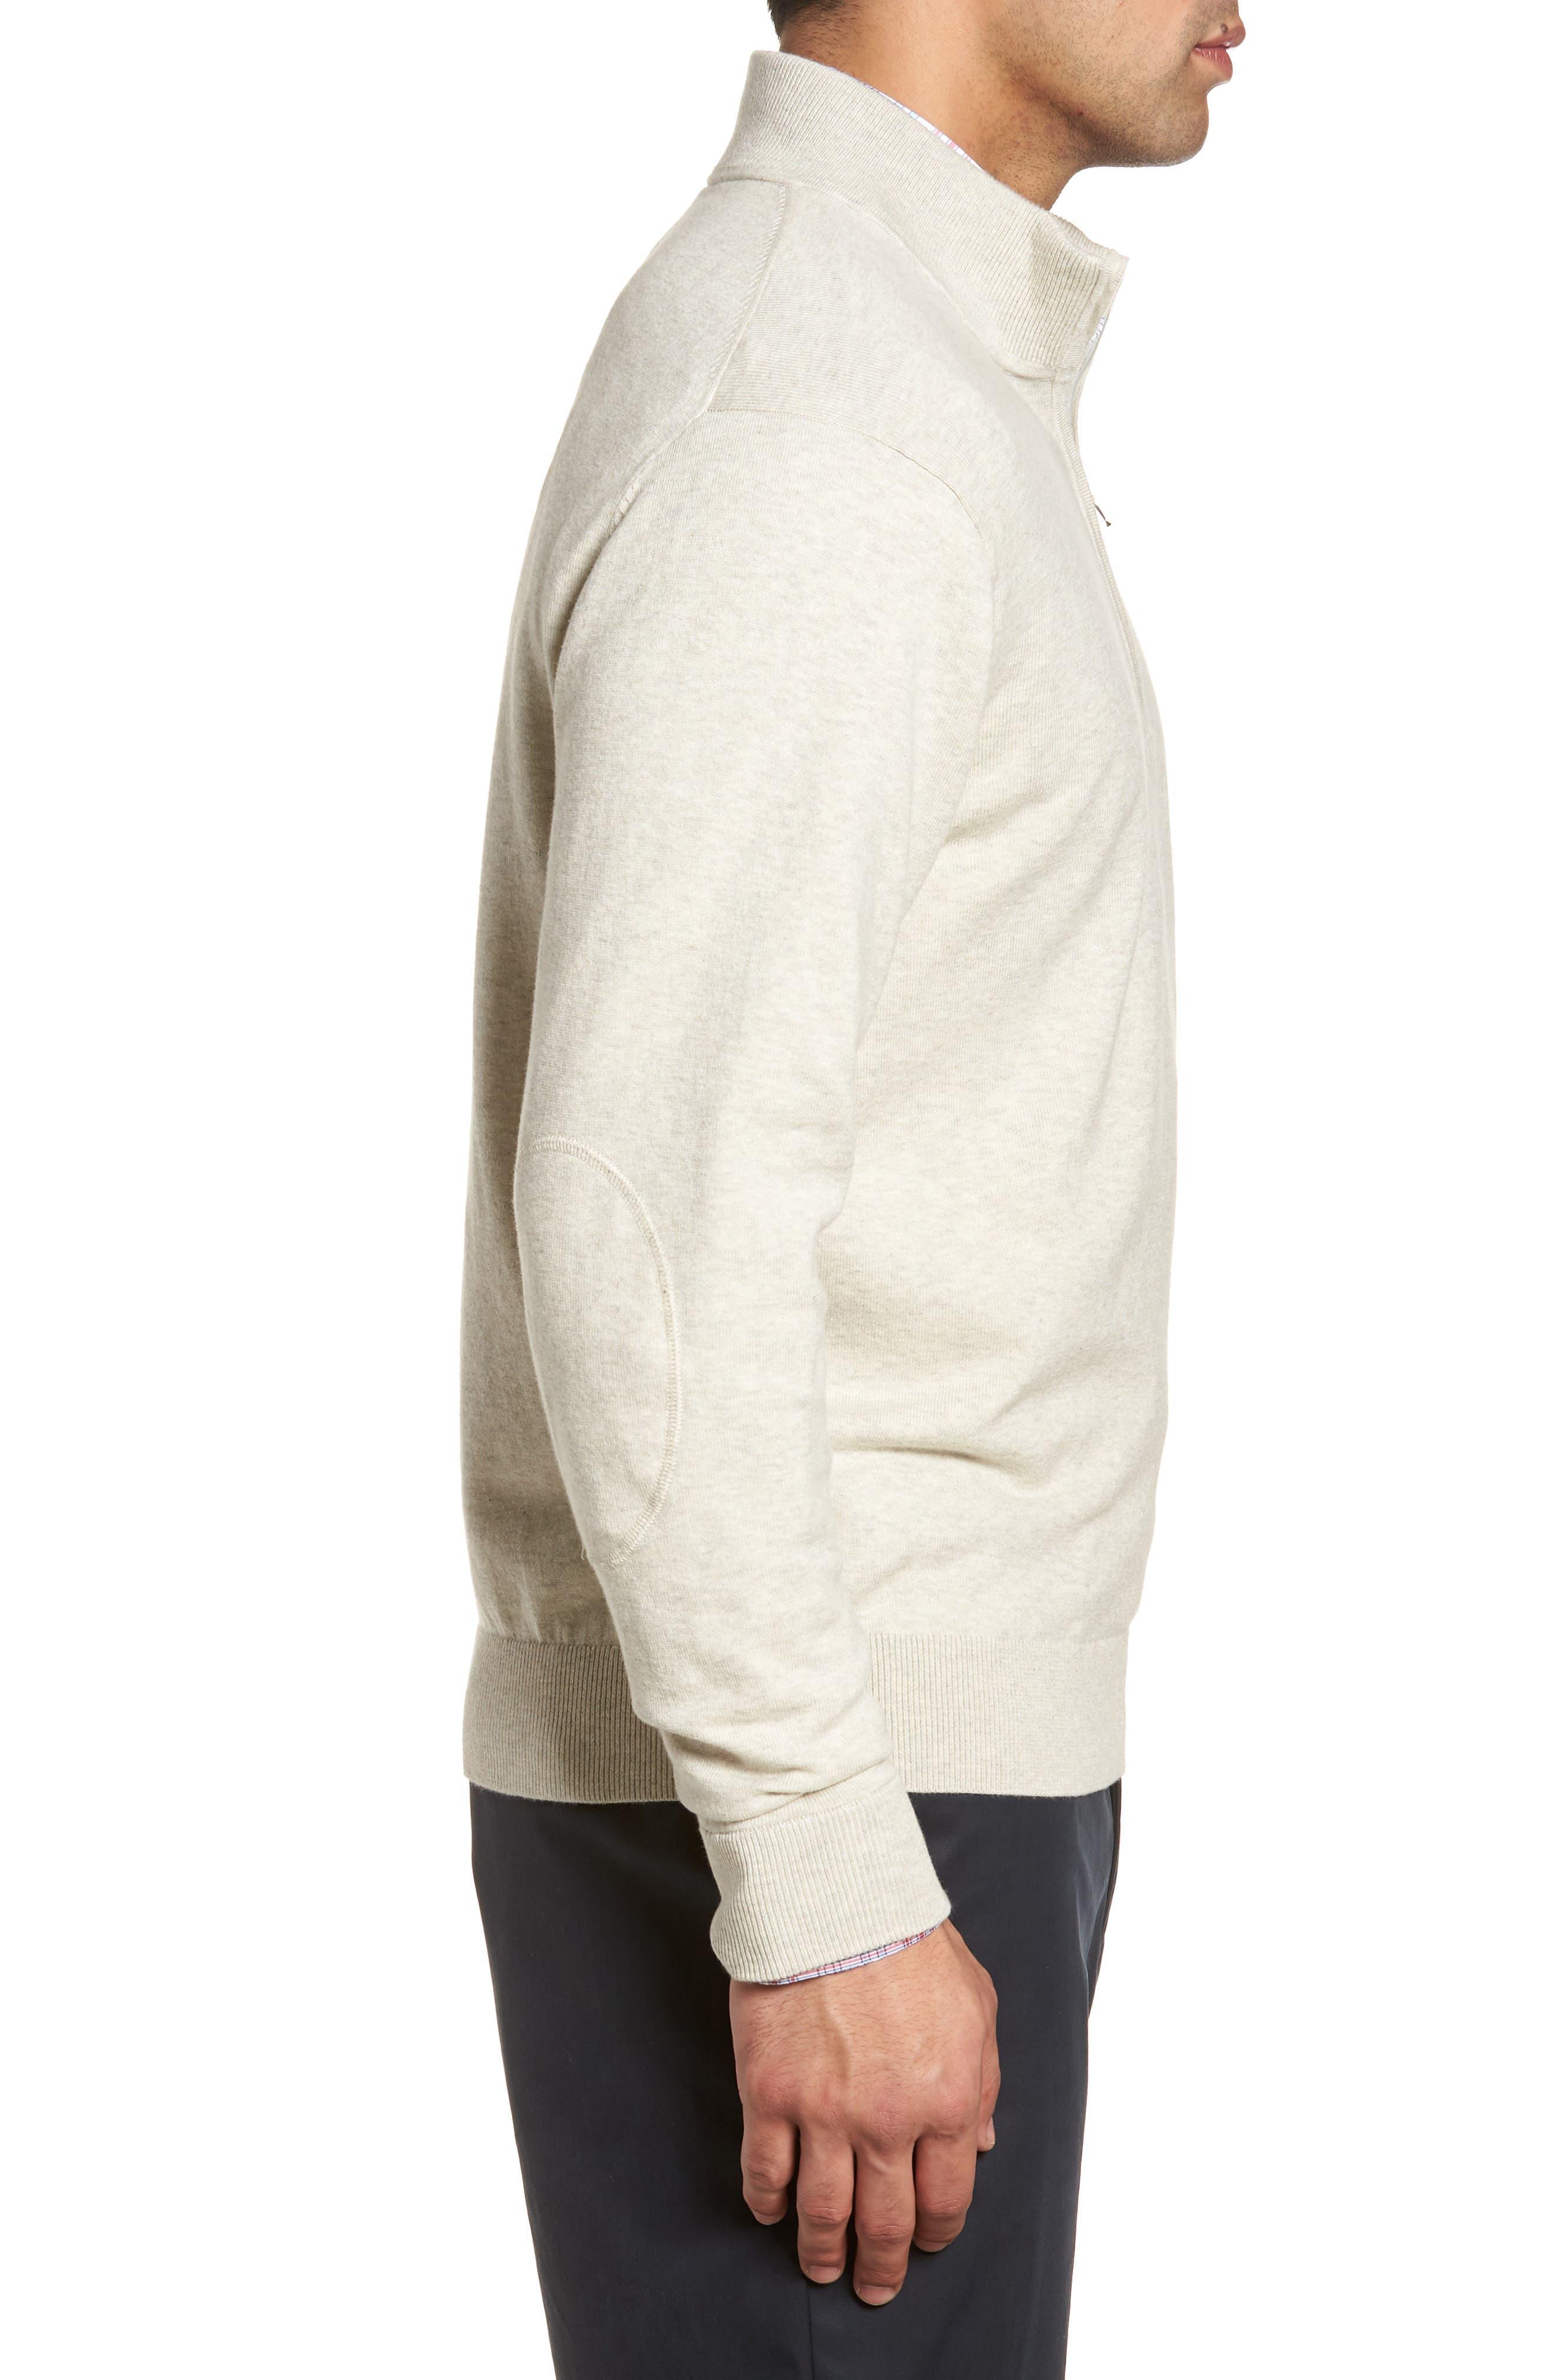 CUTTER & BUCK,                             Lakemont Classic Fit Quarter Zip Sweater,                             Alternate thumbnail 3, color,                             OATMEAL HEATHER